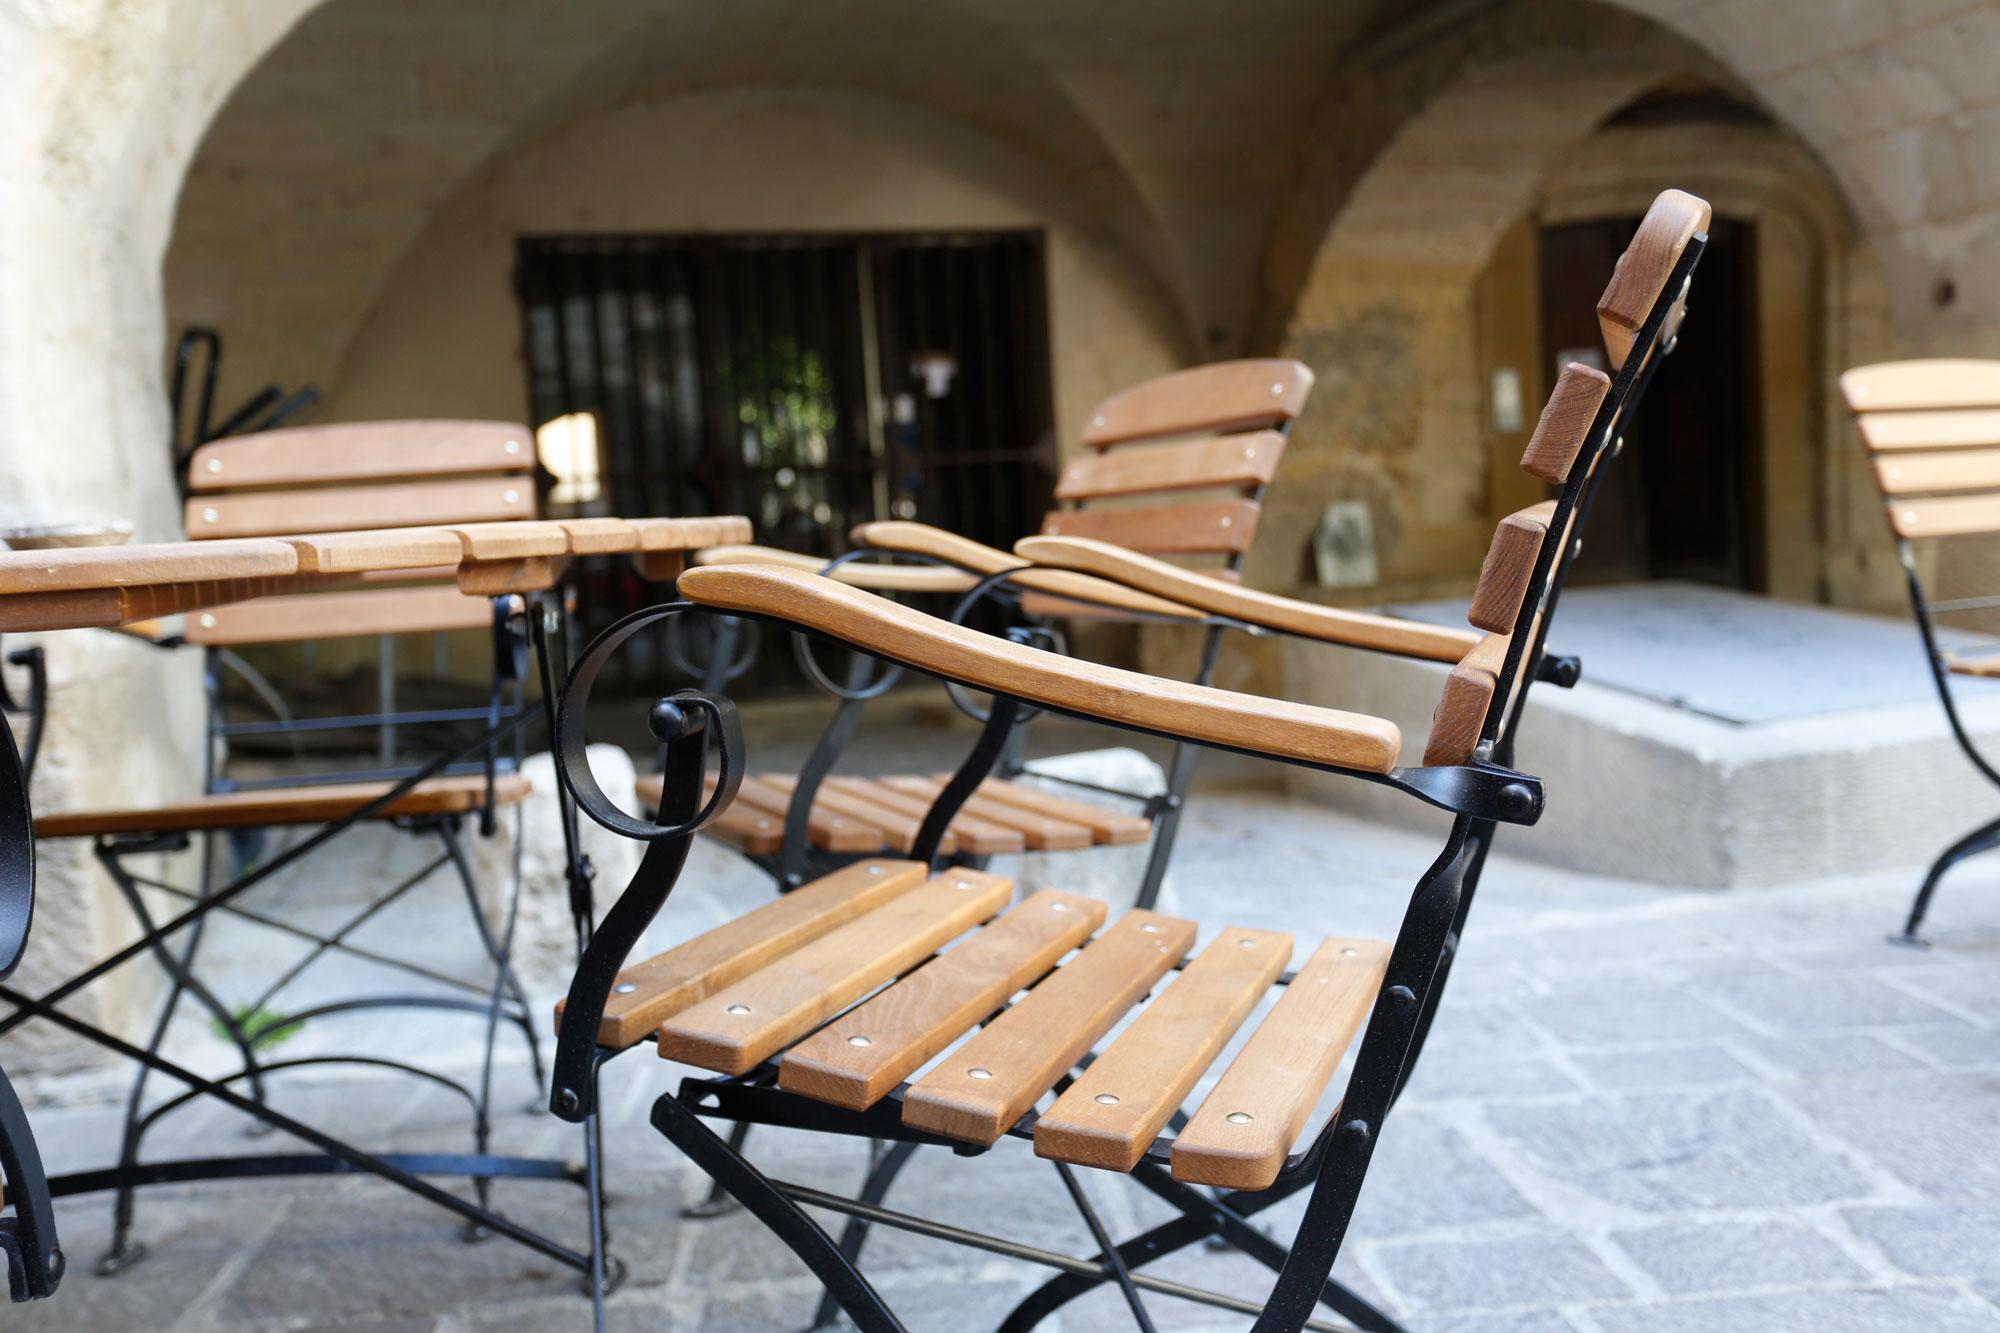 SILLA-PROVENCE-LA-REINASSENCE-MOBILIARIO-VERGES-COMERCIAL  - Mobiliario de Oficina